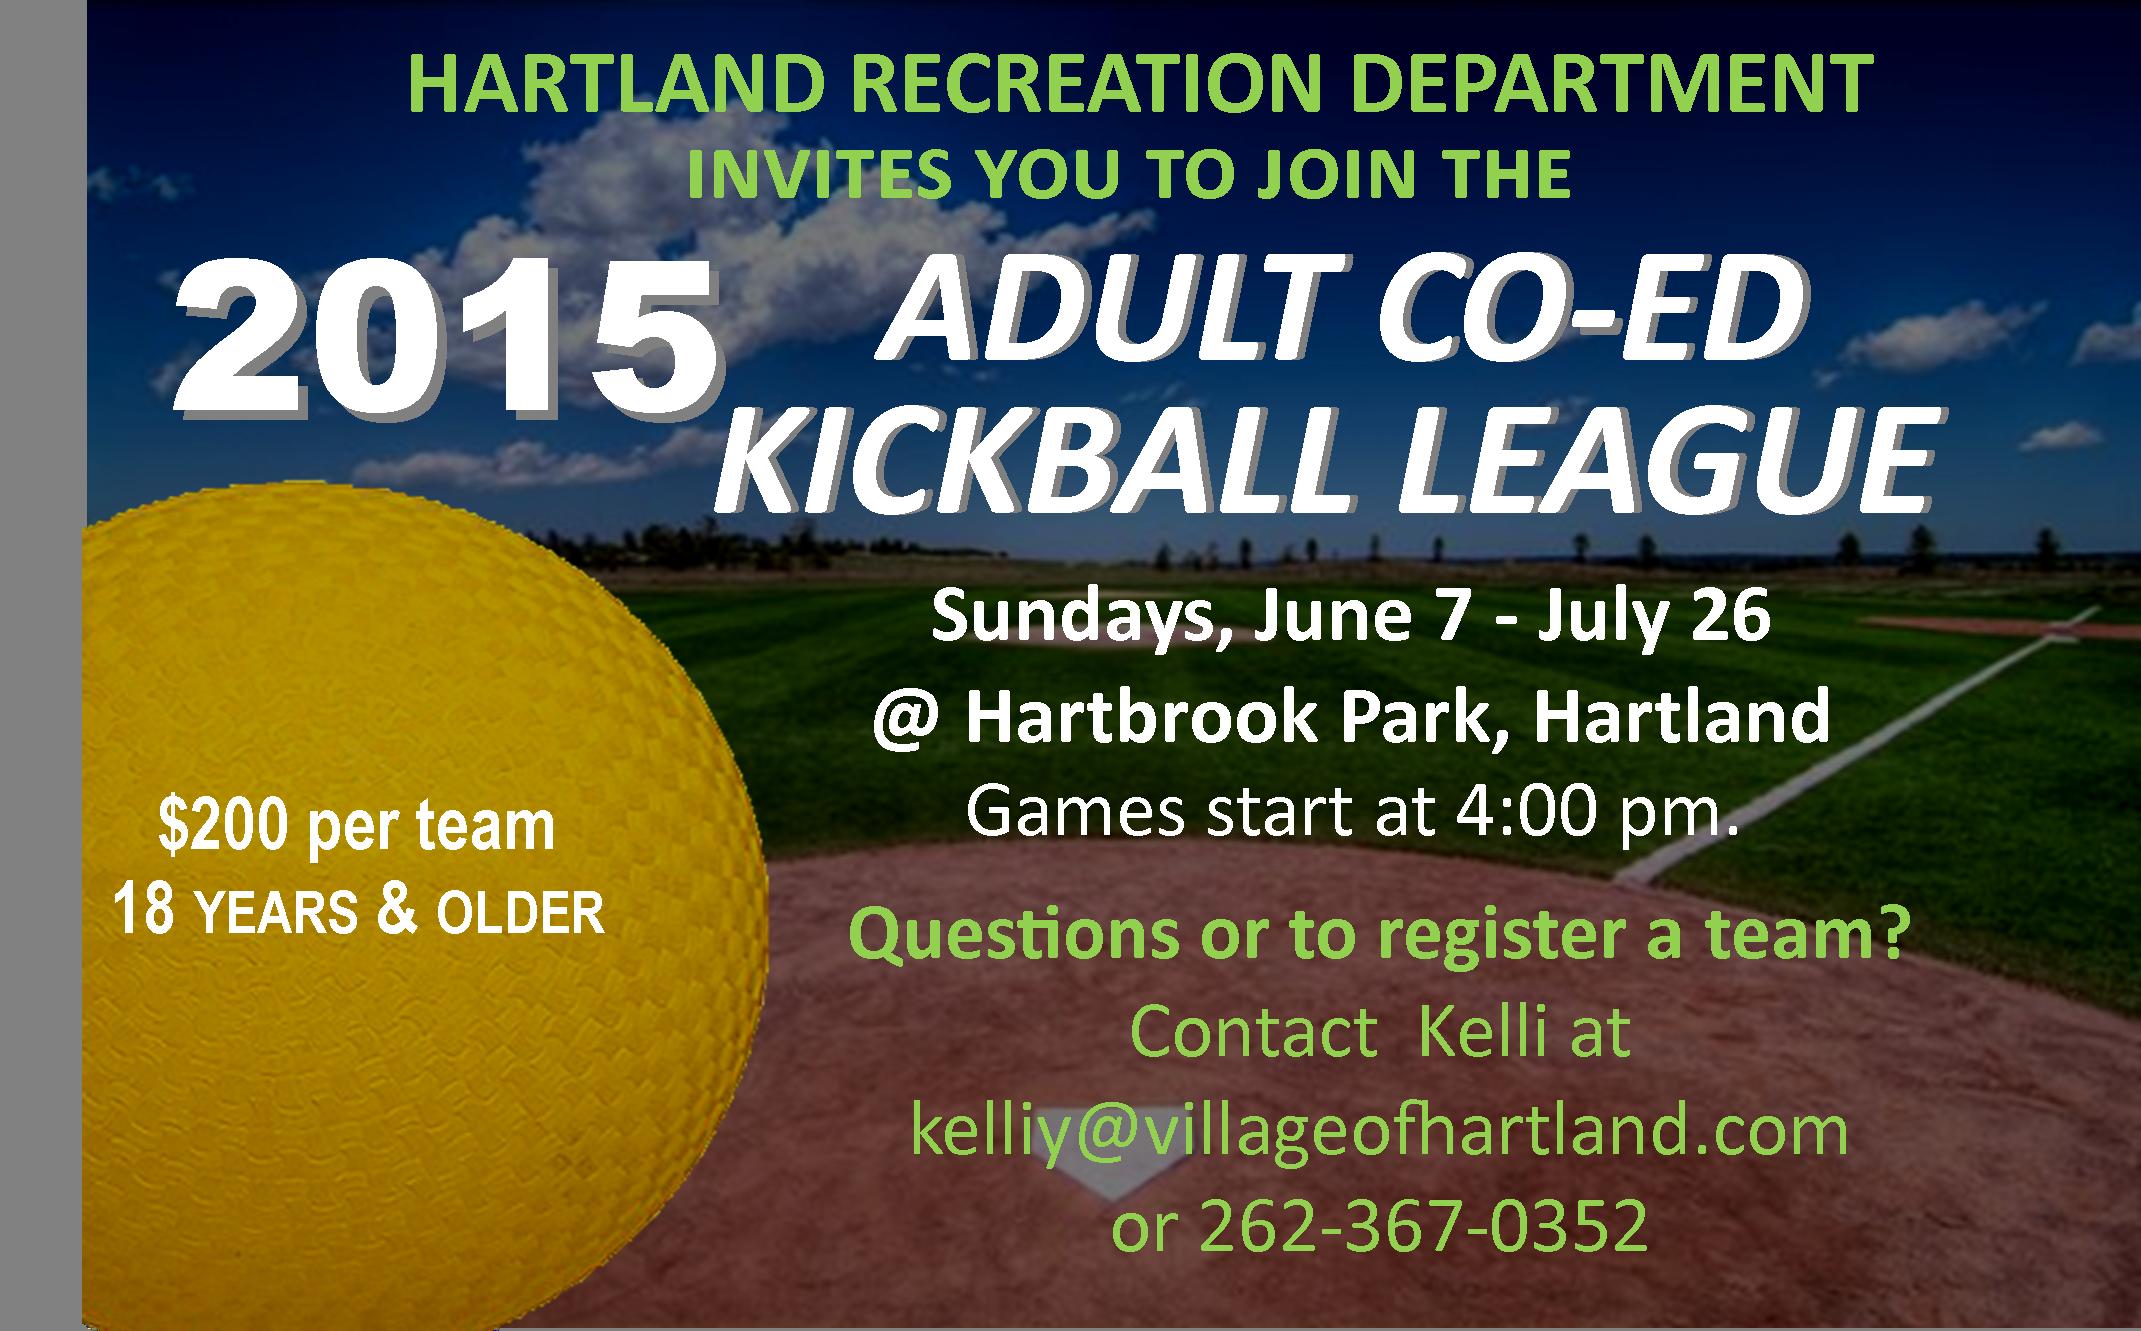 Adult Co-Ed Kickball League